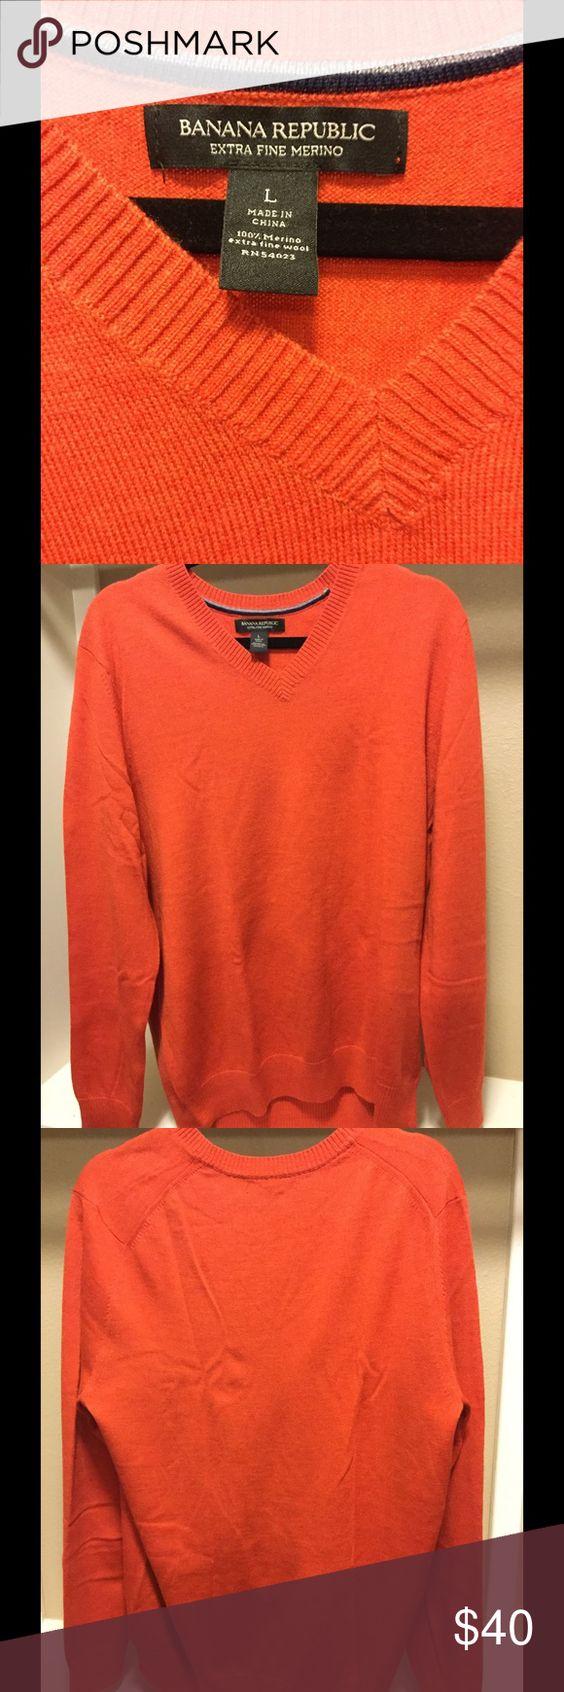 BananaRepublic. V-Neck Merino sweater. Orange. L BananaRepublic. V-Neck Merino sweater. Orange. Size Large. Never worn Banana Republic Sweaters V-Neck